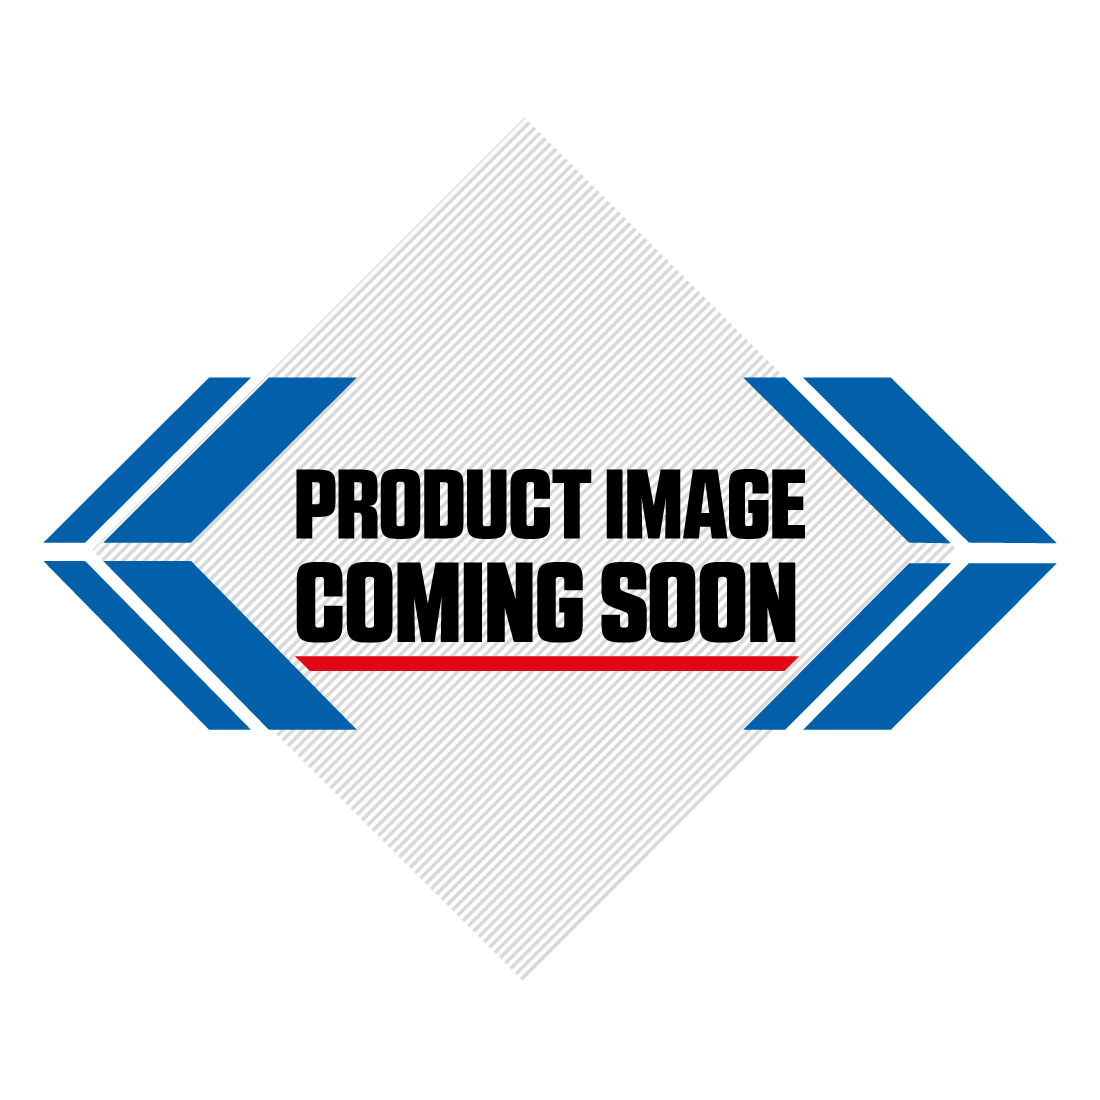 Kawasaki Restyled Plastic Kit KX 85 (01-09) (11-12) Black Image-3>